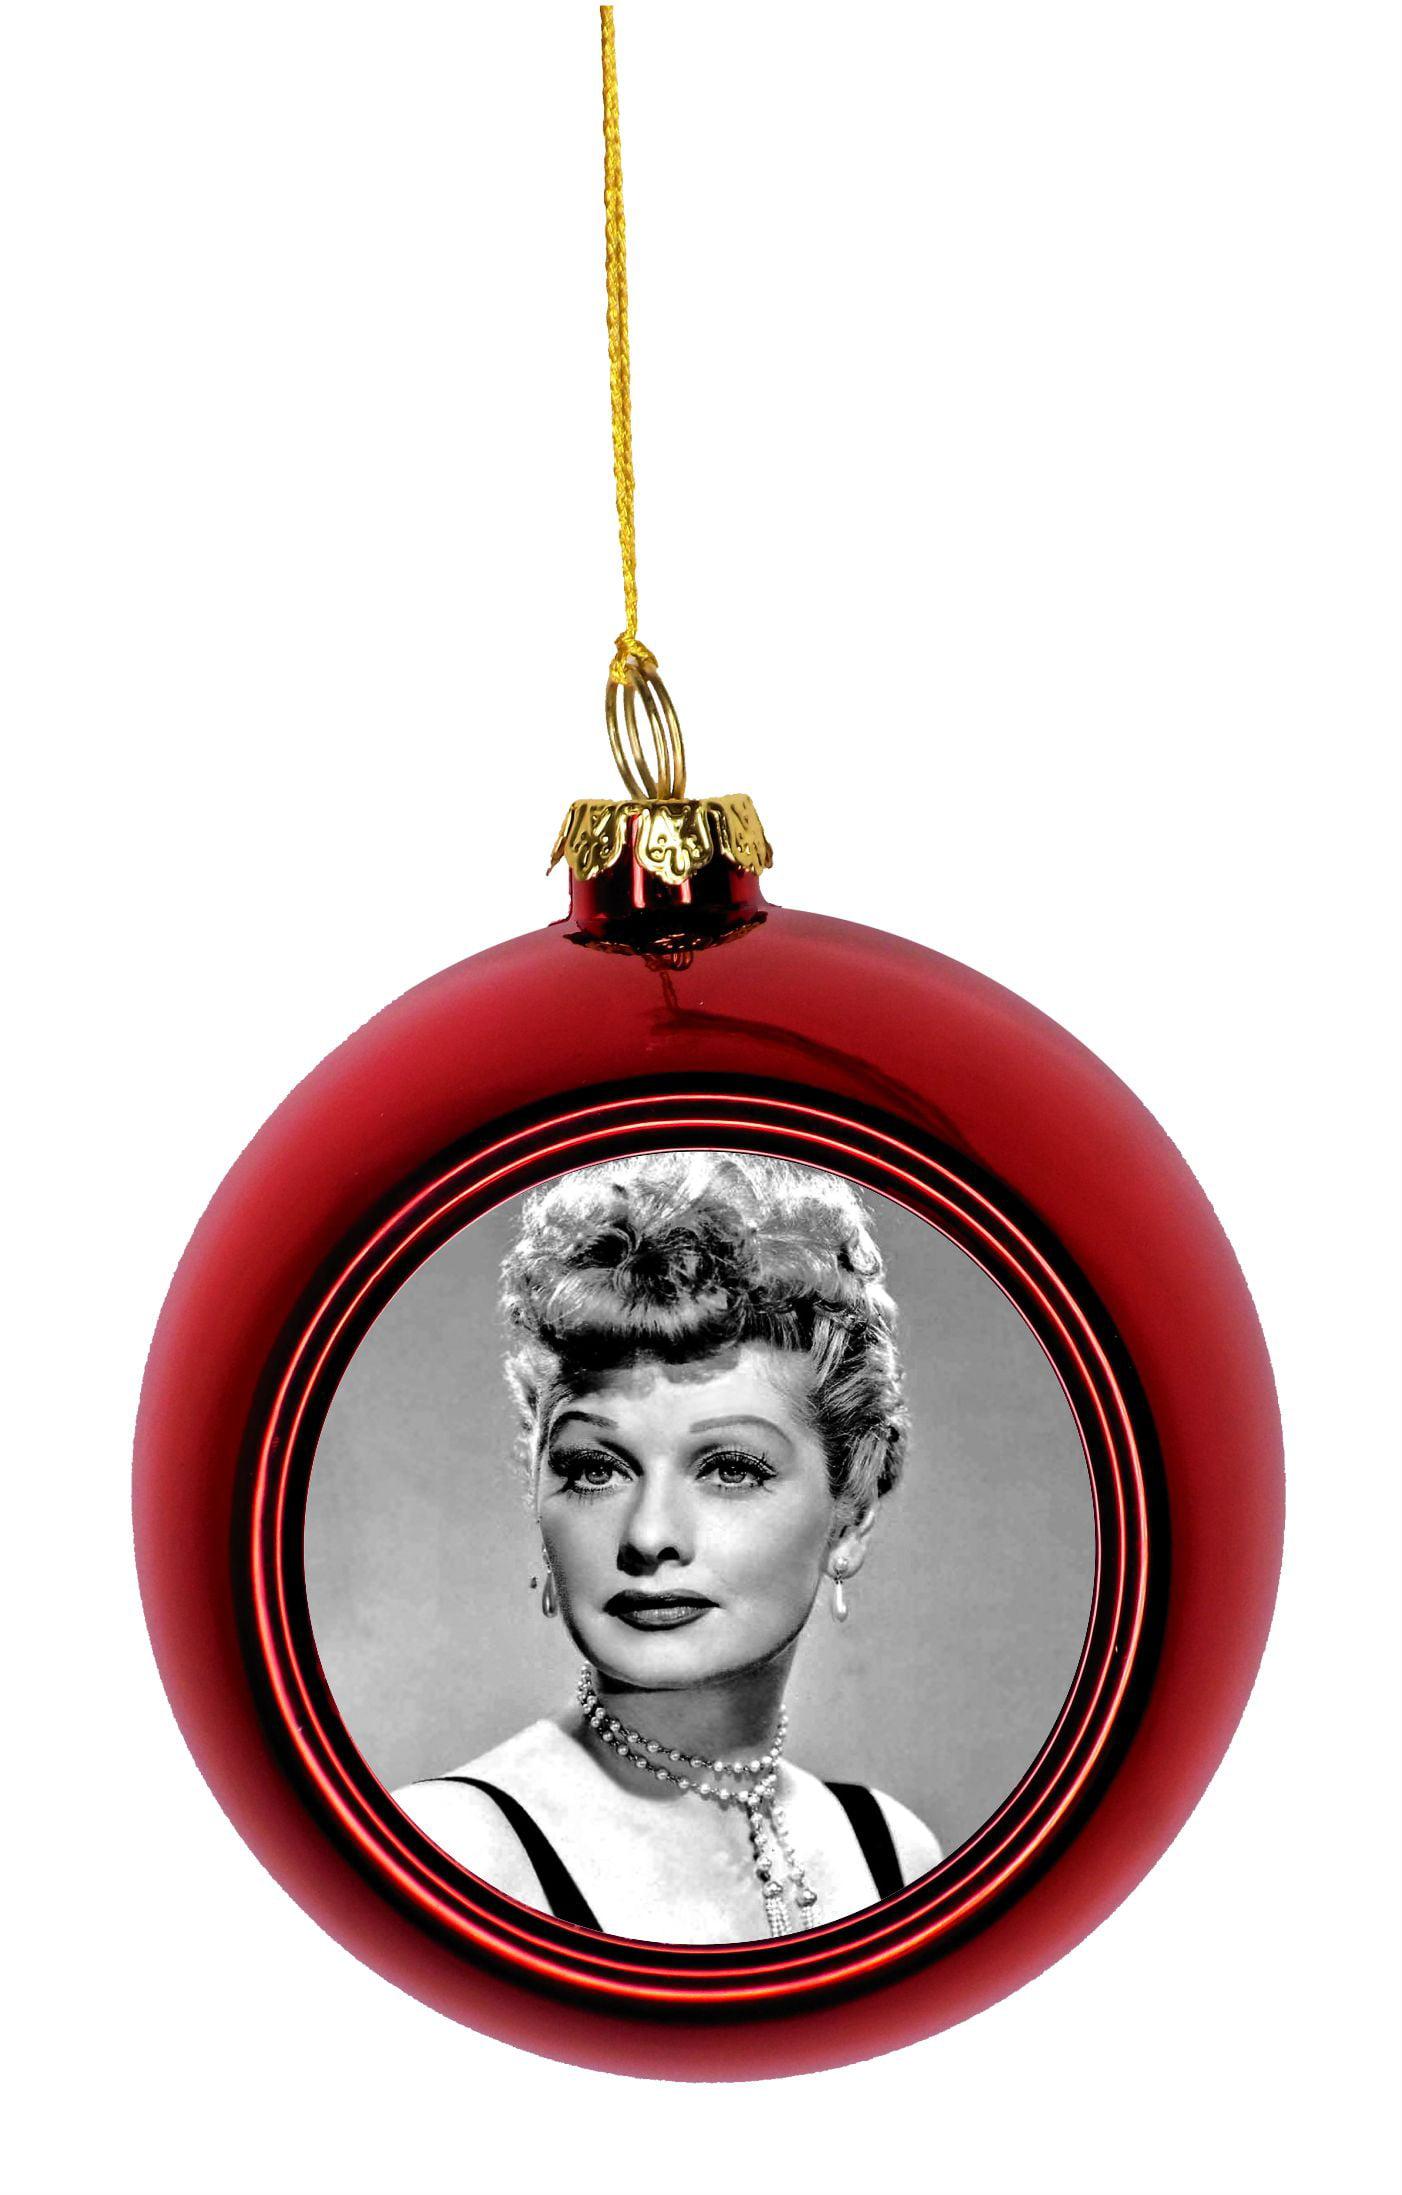 GLITTER ORNAMENTS Christmas Tree Bauble Novelty Dress It Up Craft Embellishments